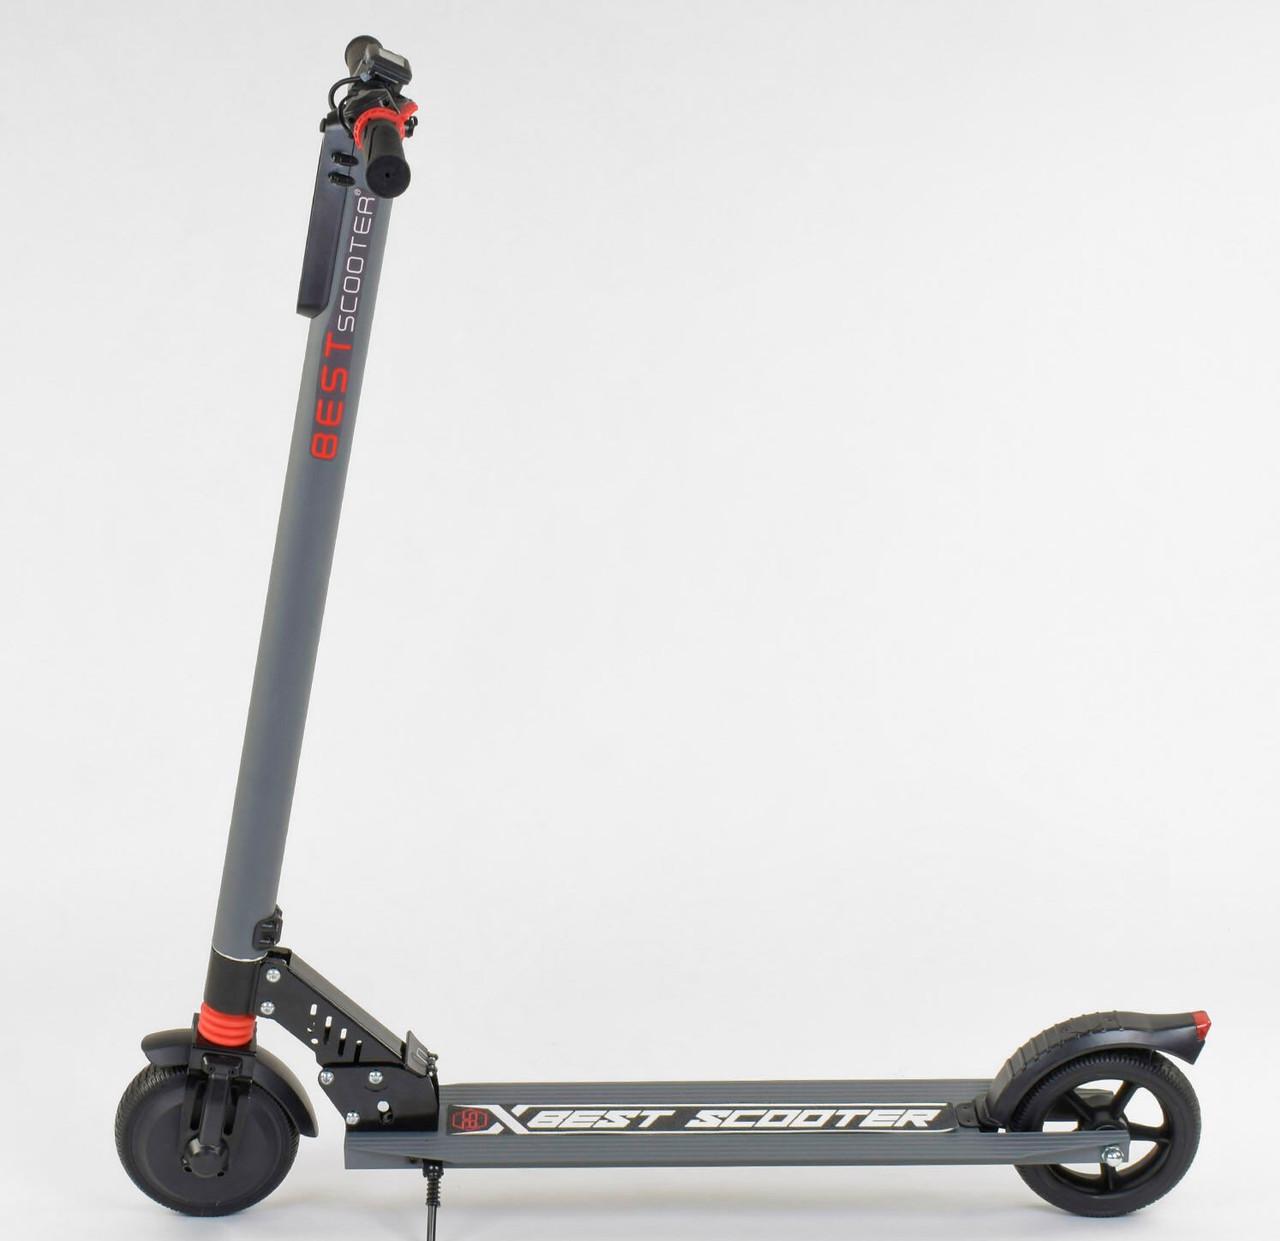 "Электросамокат 83325 (1) ""Best scooter"", колеса 6,5"", цвет СЕРЫЙ Гарантия качества Быстрая доставка"